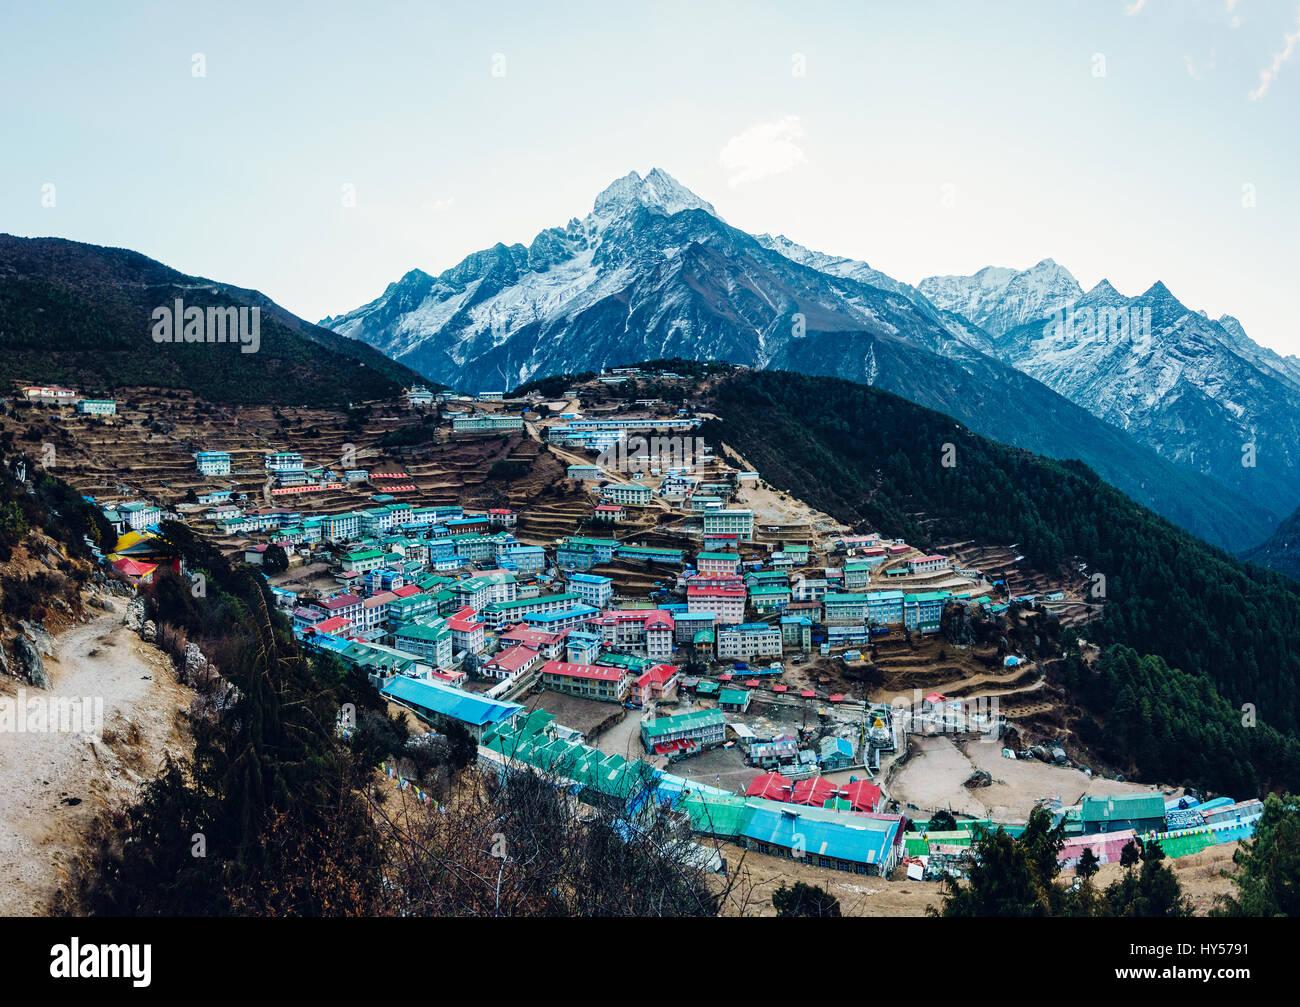 Namche Bazaar and Thamserku mountain in Solukhumbu district, Nepal - Stock Image